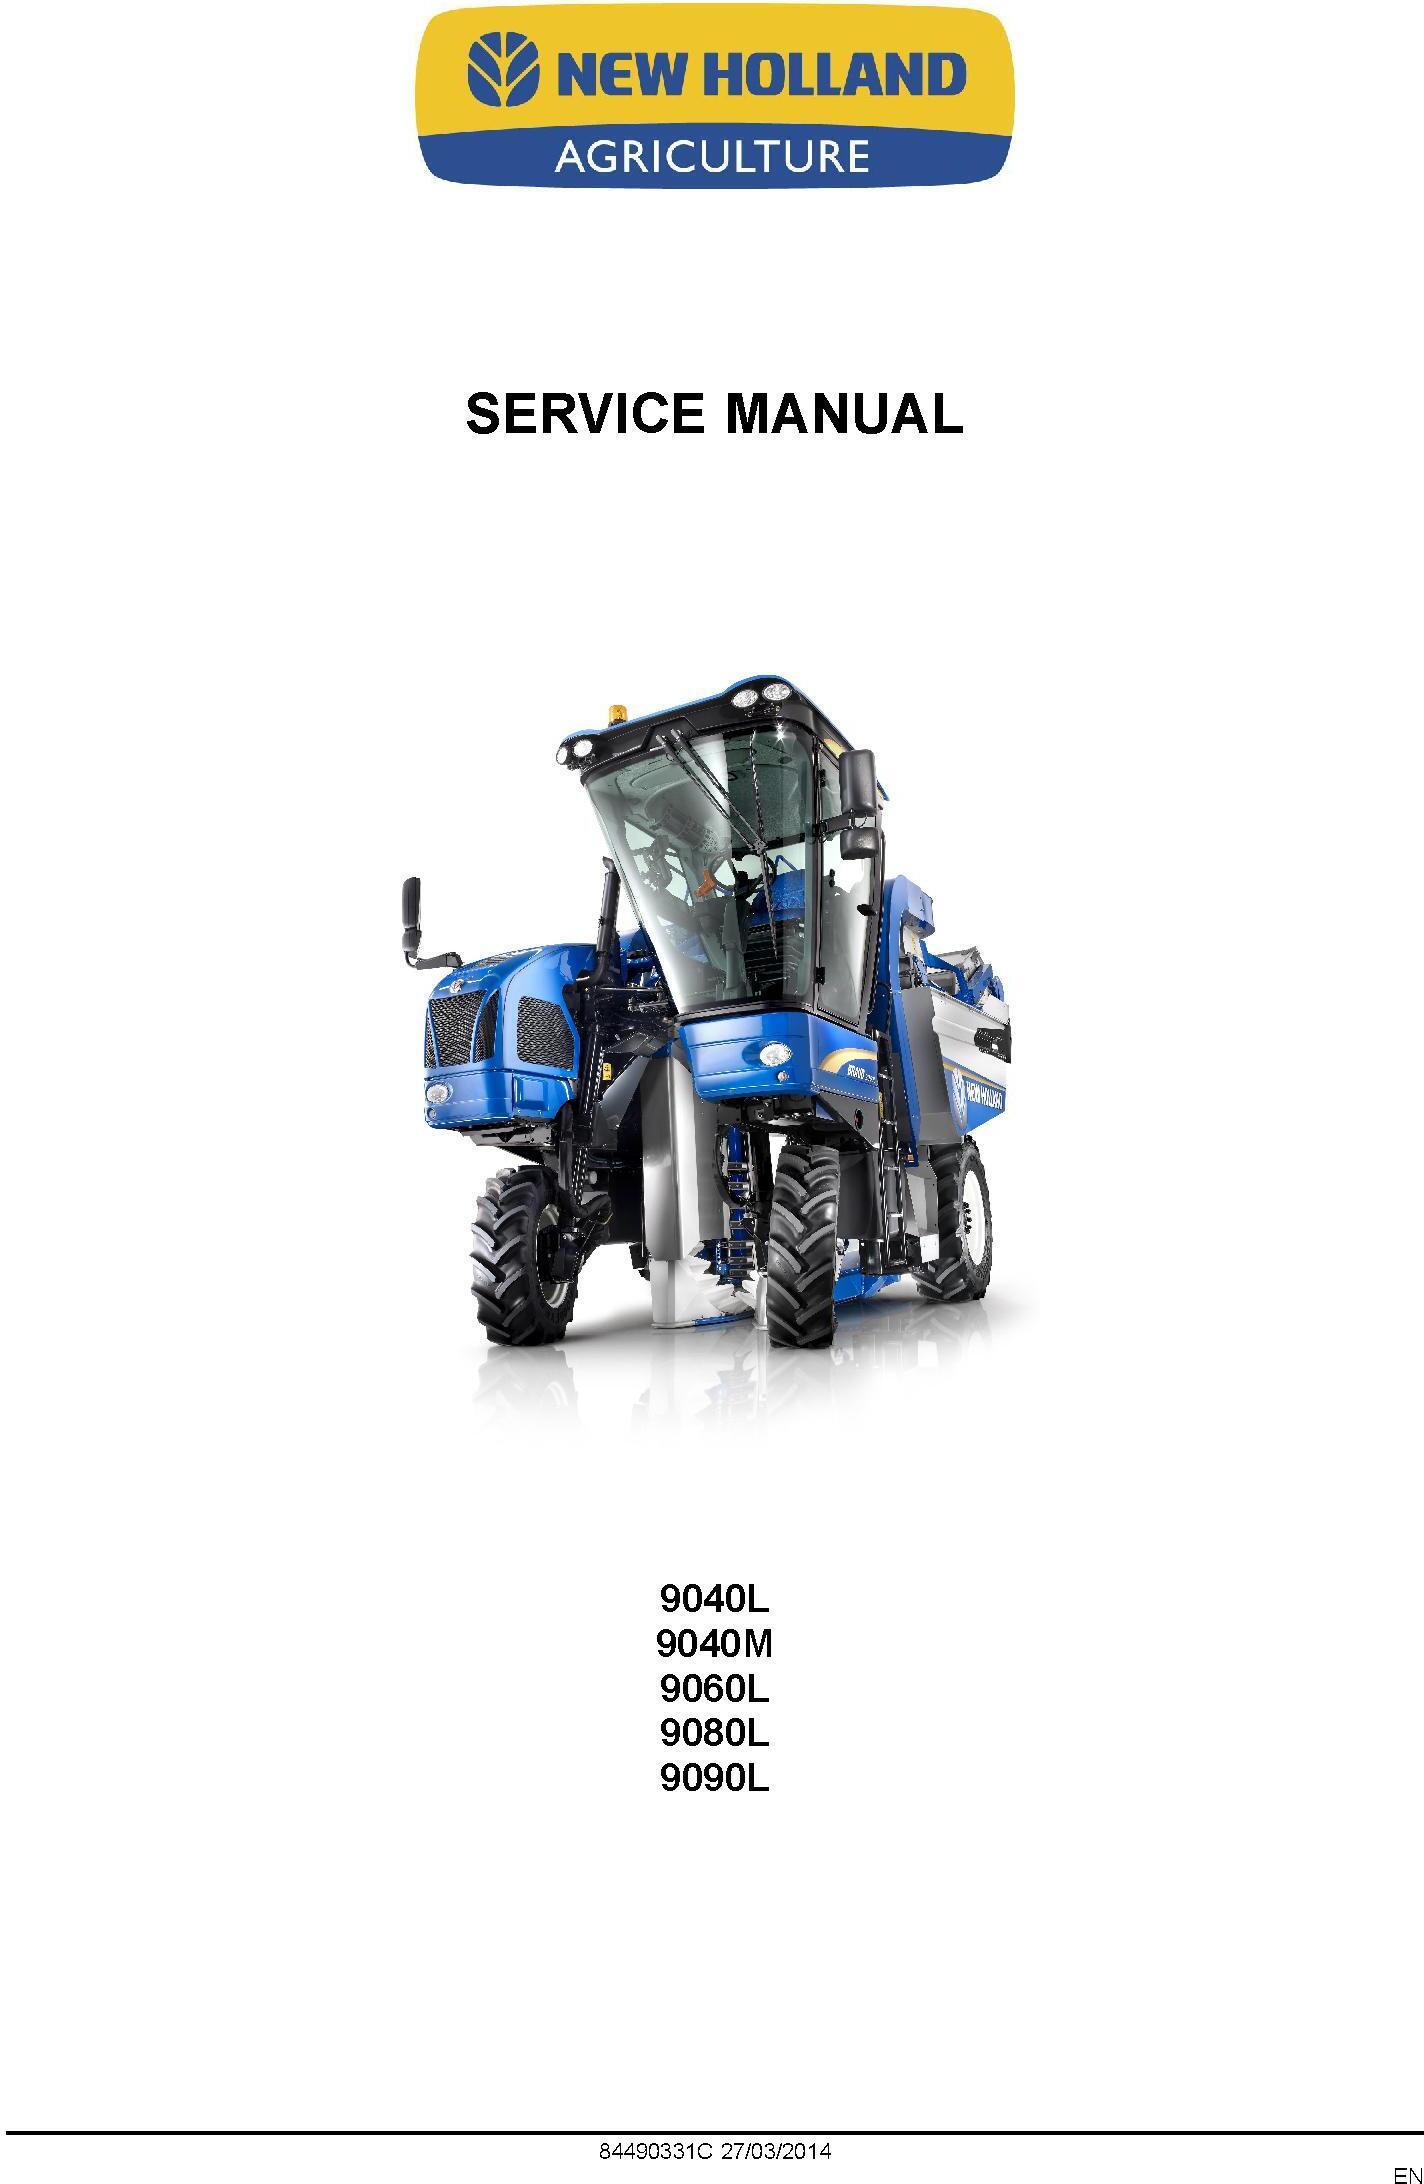 New Holland 9040L, 9040M, 9060L (H), 9080L (H), 9090L (H,GE) Grape Harvester Service Manual - 1